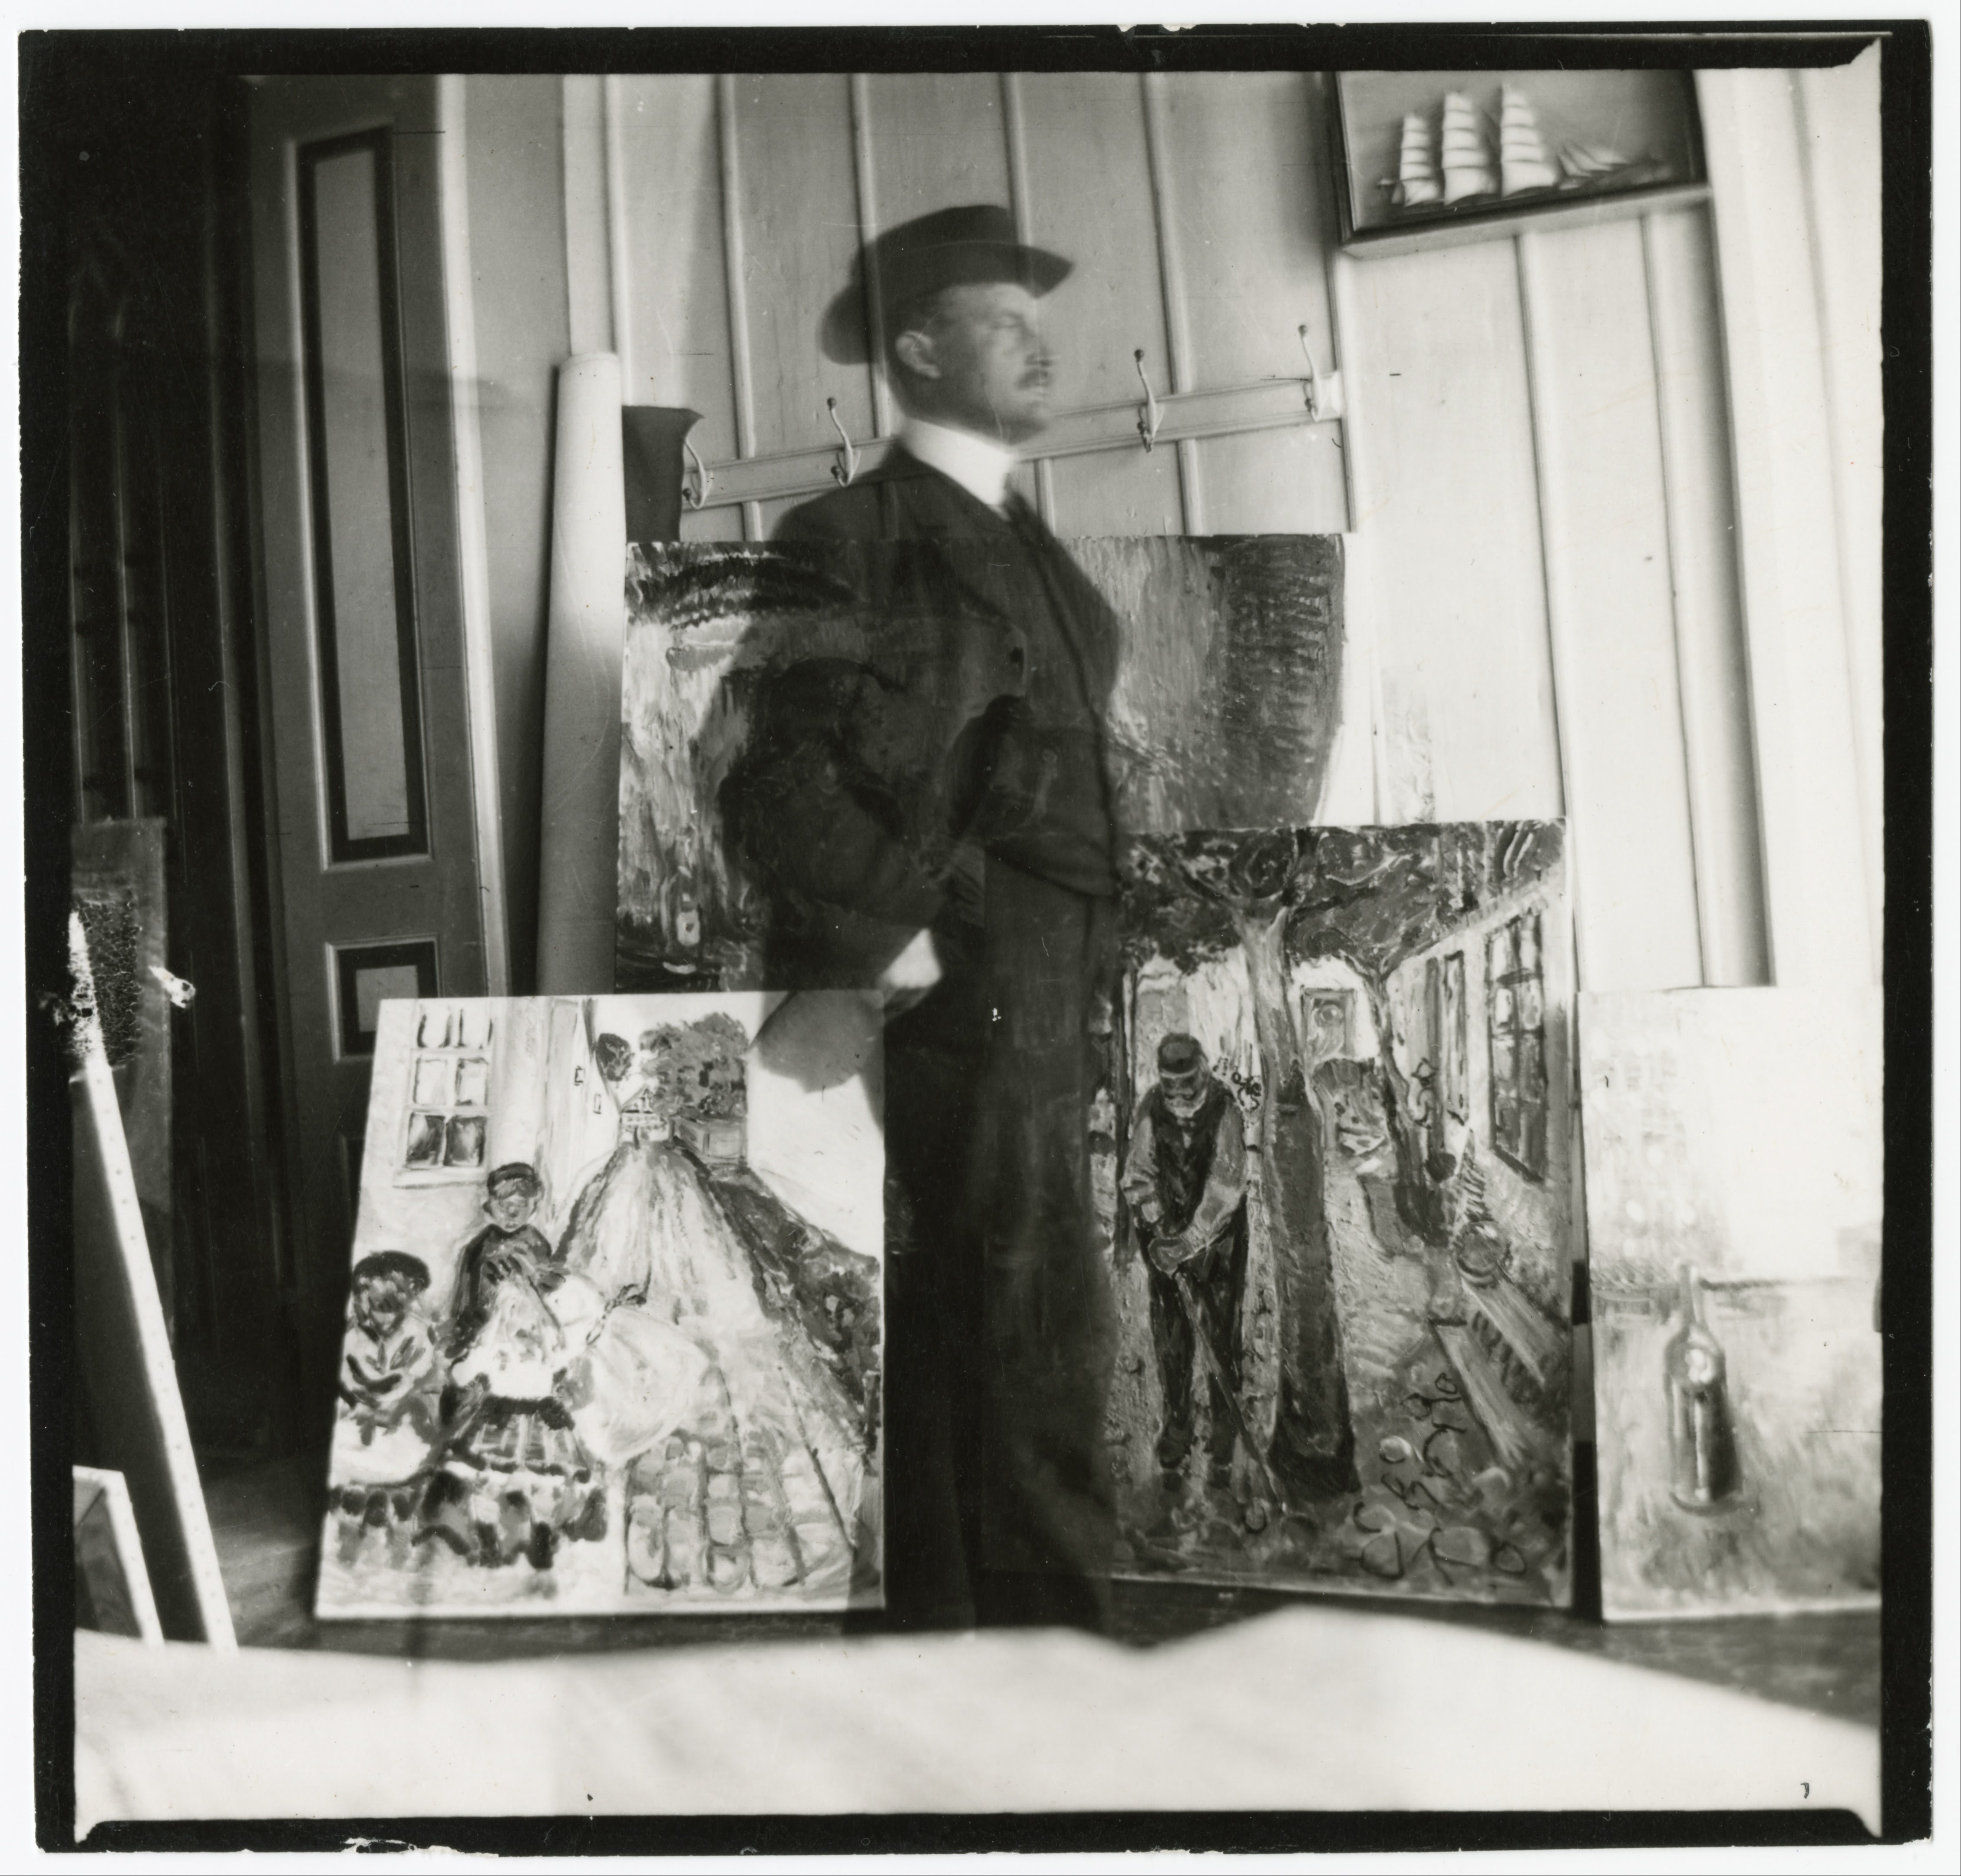 Edvard_Munch_-_Self-Portrait_at_53_Am_Strom_in_Warnemünde_-_Google_Art_Project